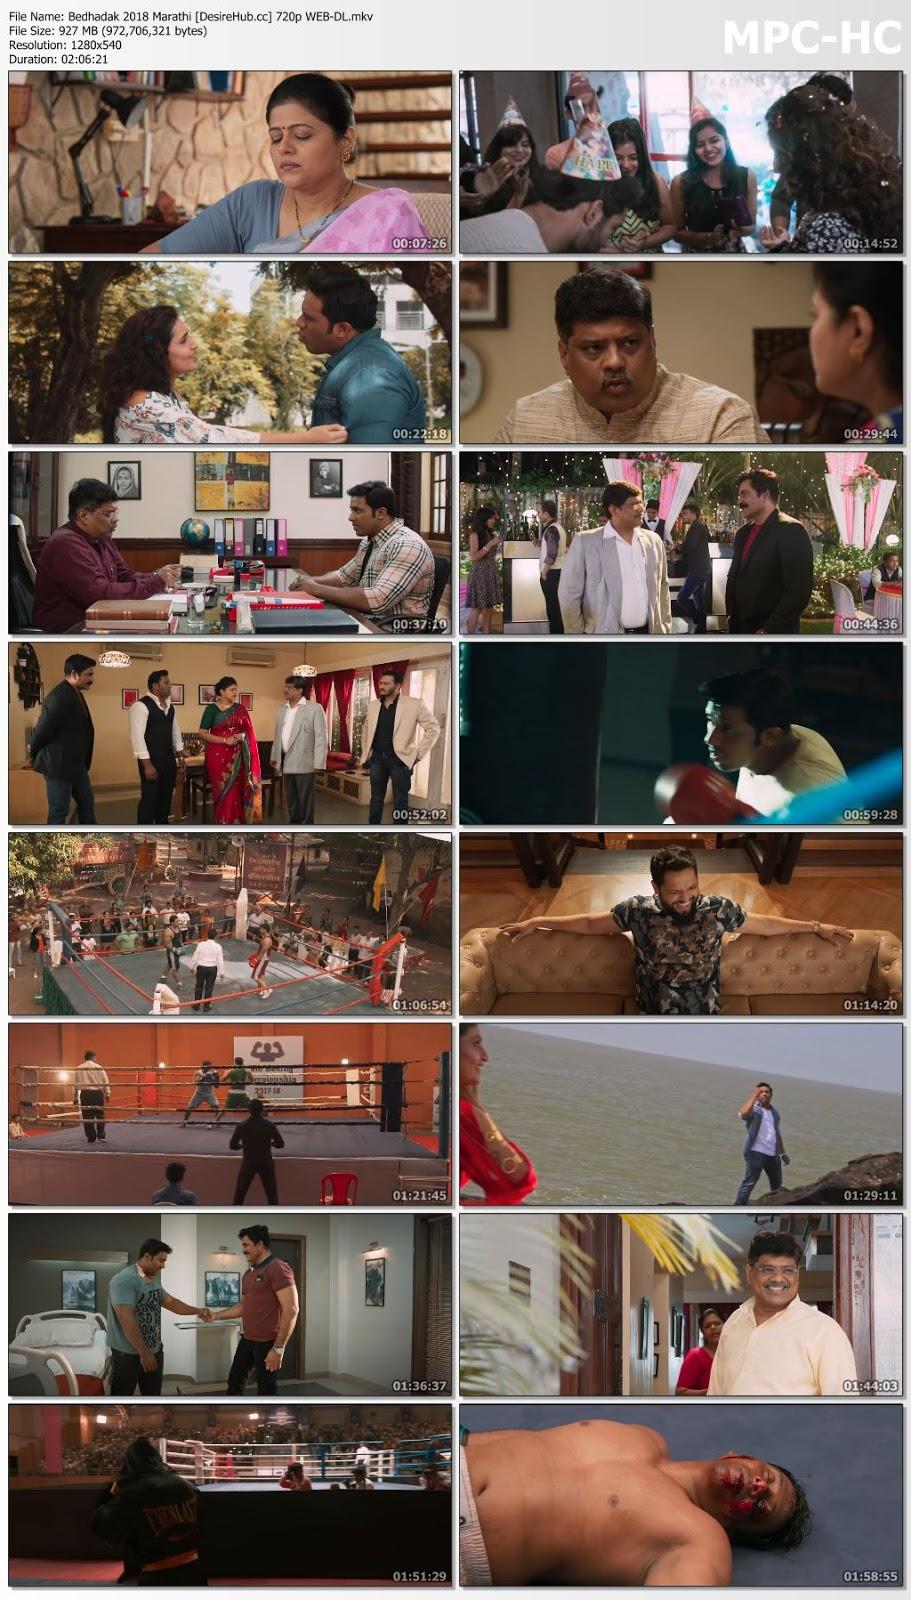 Bedhadak 2018 Marathi 720p WEB-DL 900mb Desirehub